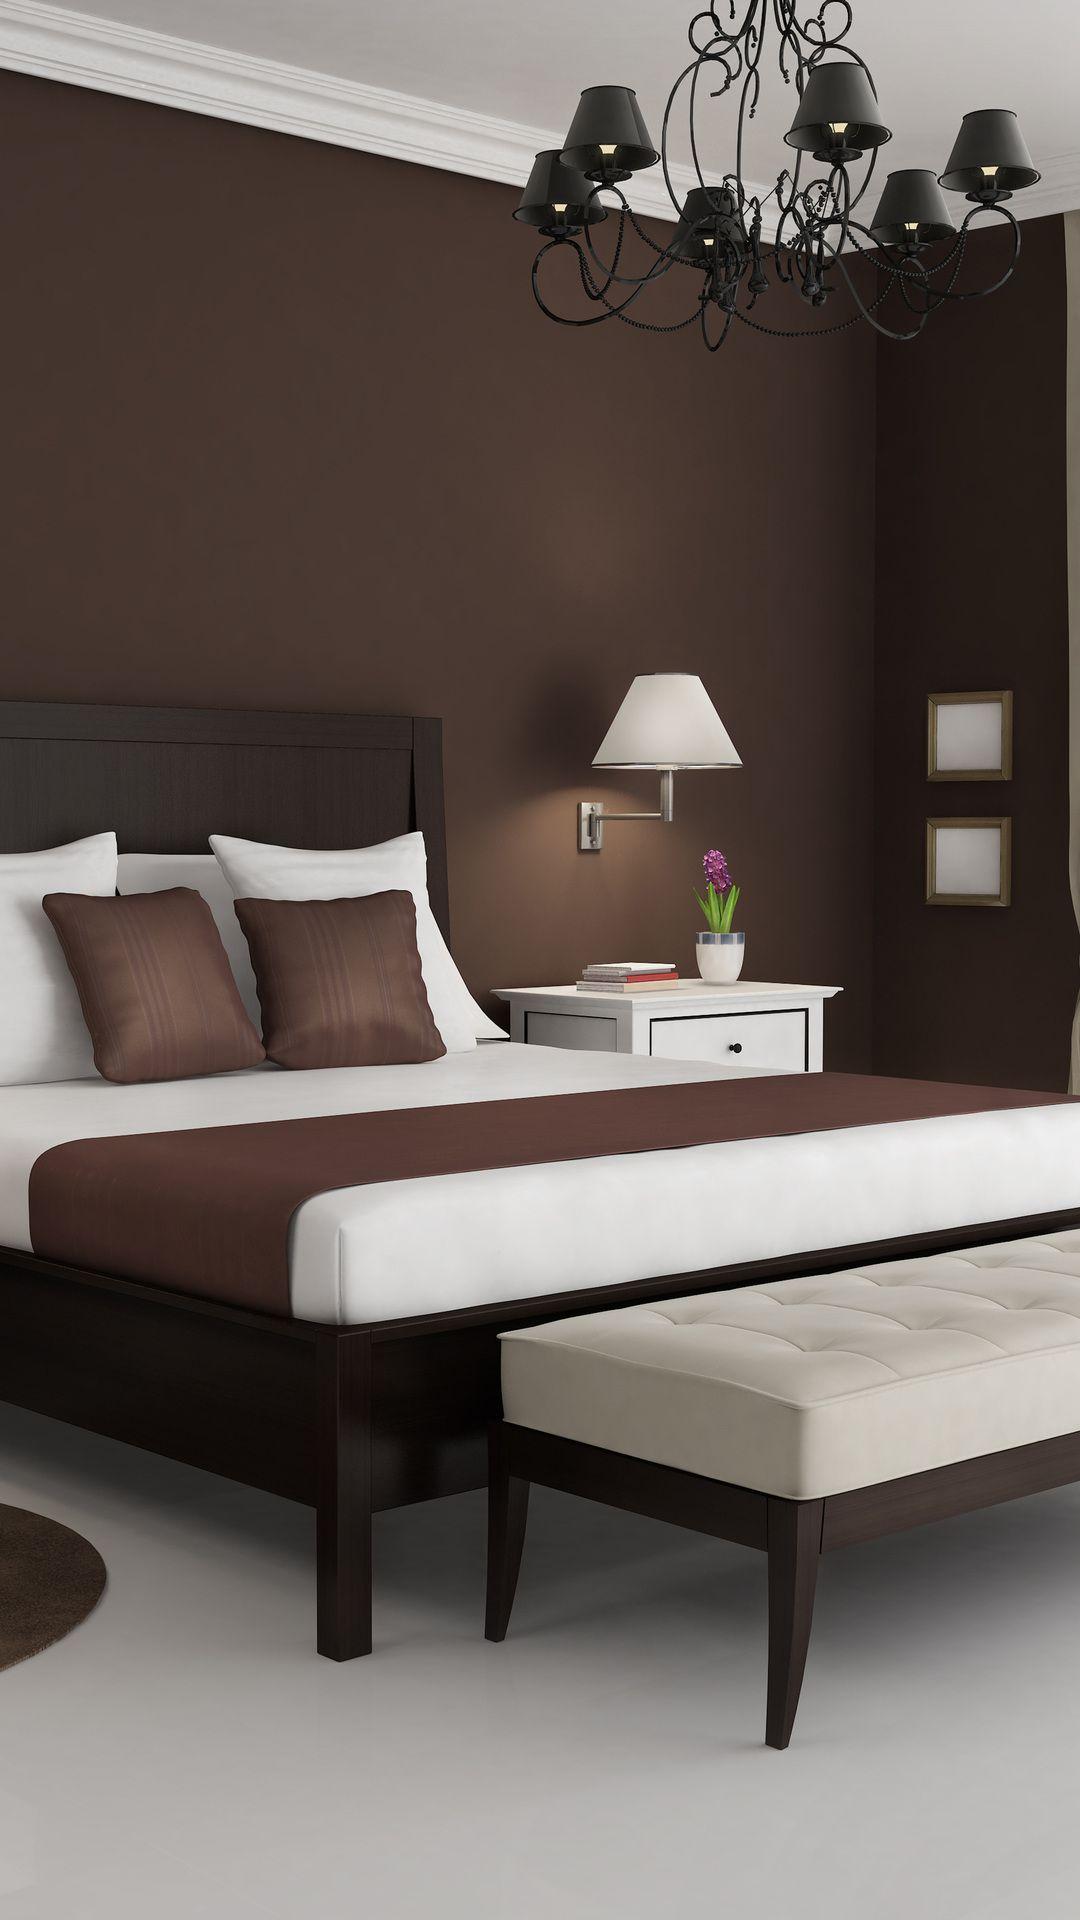 1080x1920 Brown Interior Bedroom Design White 3d Style Furniturearrangementideas Furnitureapartm Bedroom Decor Design Interior Paint Living Room Paint